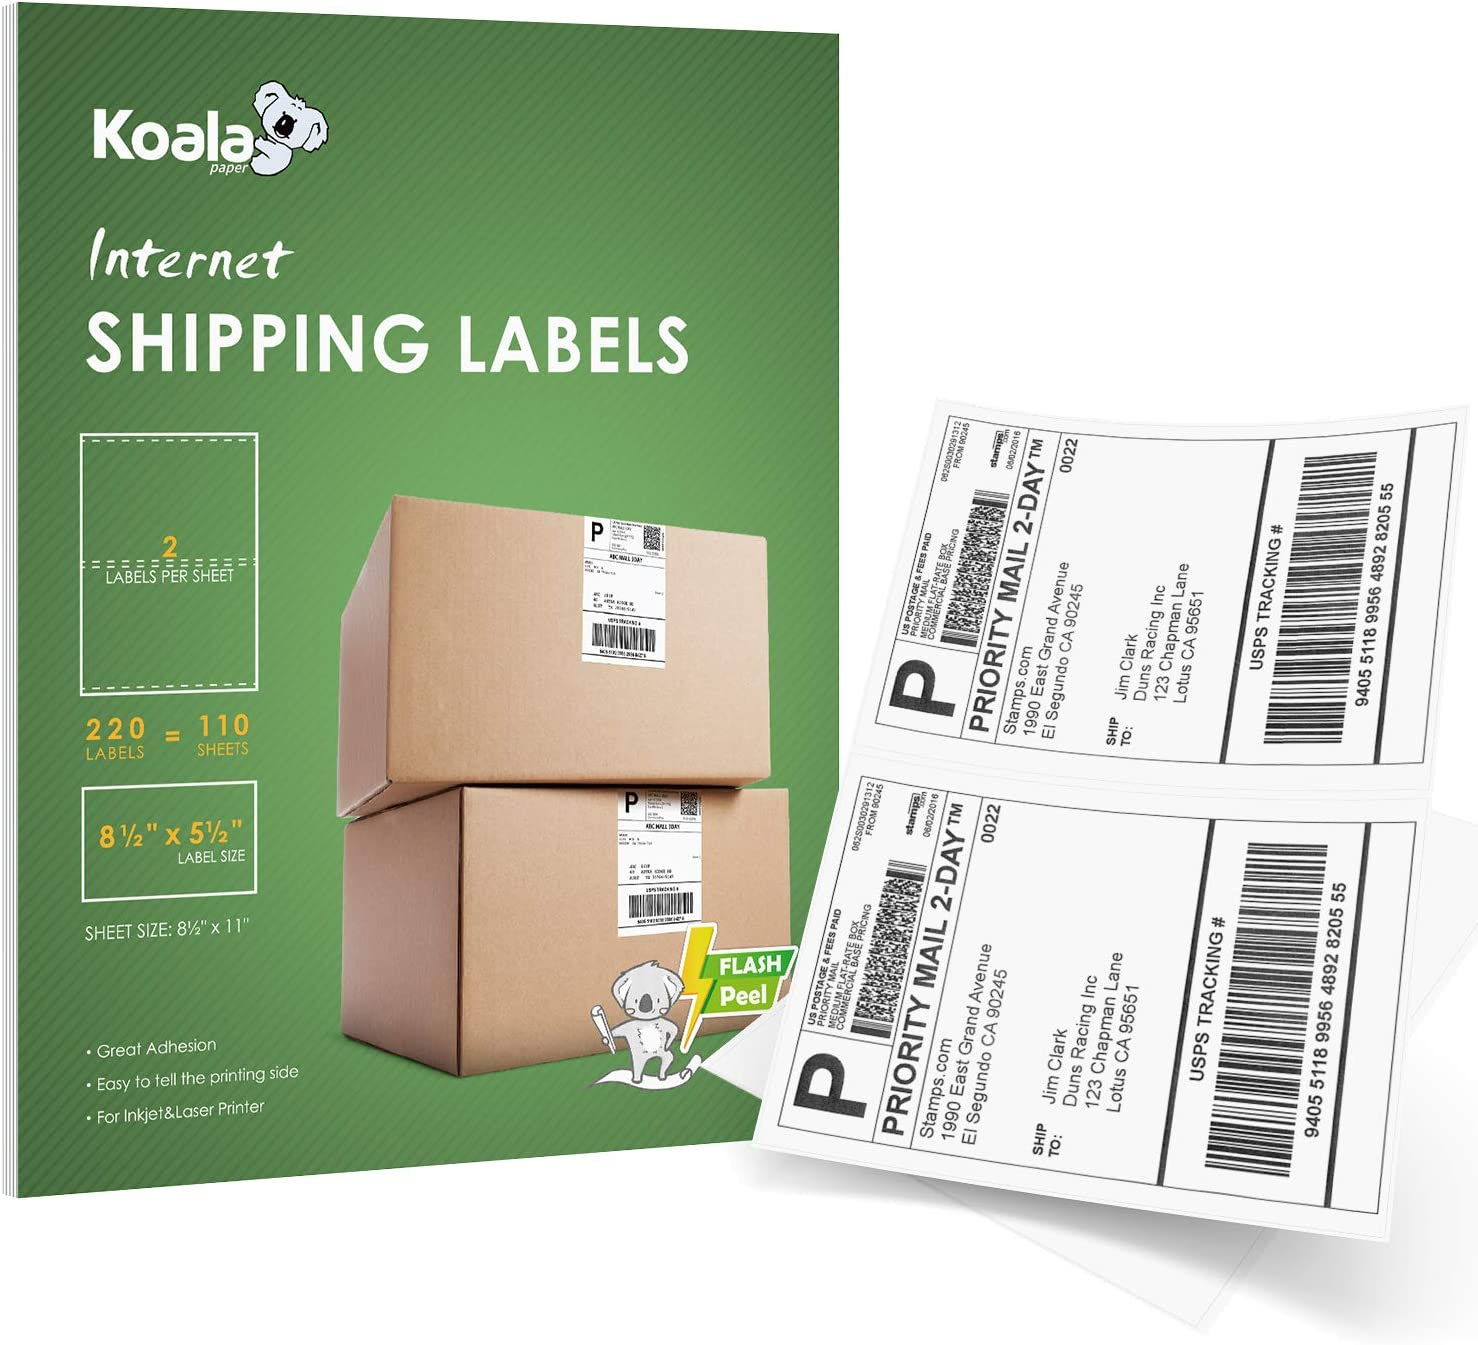 50 Half Sheet 8.5x5.5 Shipping Labels 2 onSheet Self Adhesive LASER PRINTER ONLY